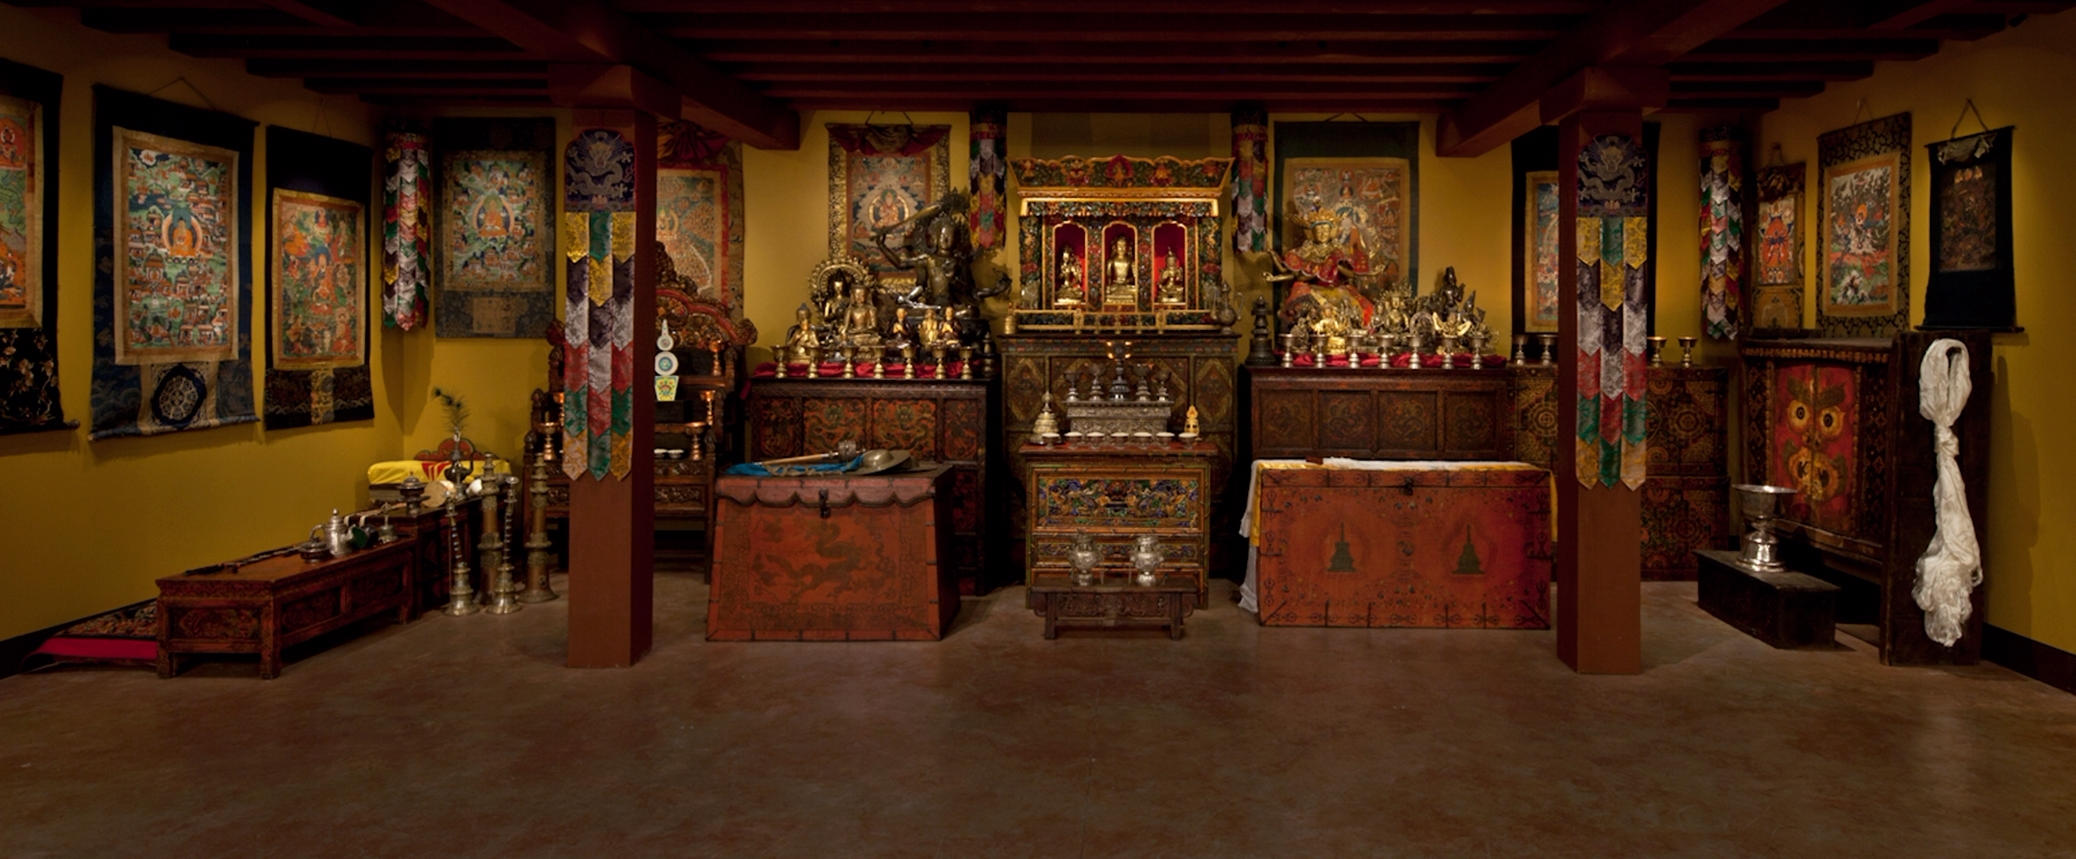 Rubin Museum Tibetan Buddist Shrine Room. Photo: Rubin Musem